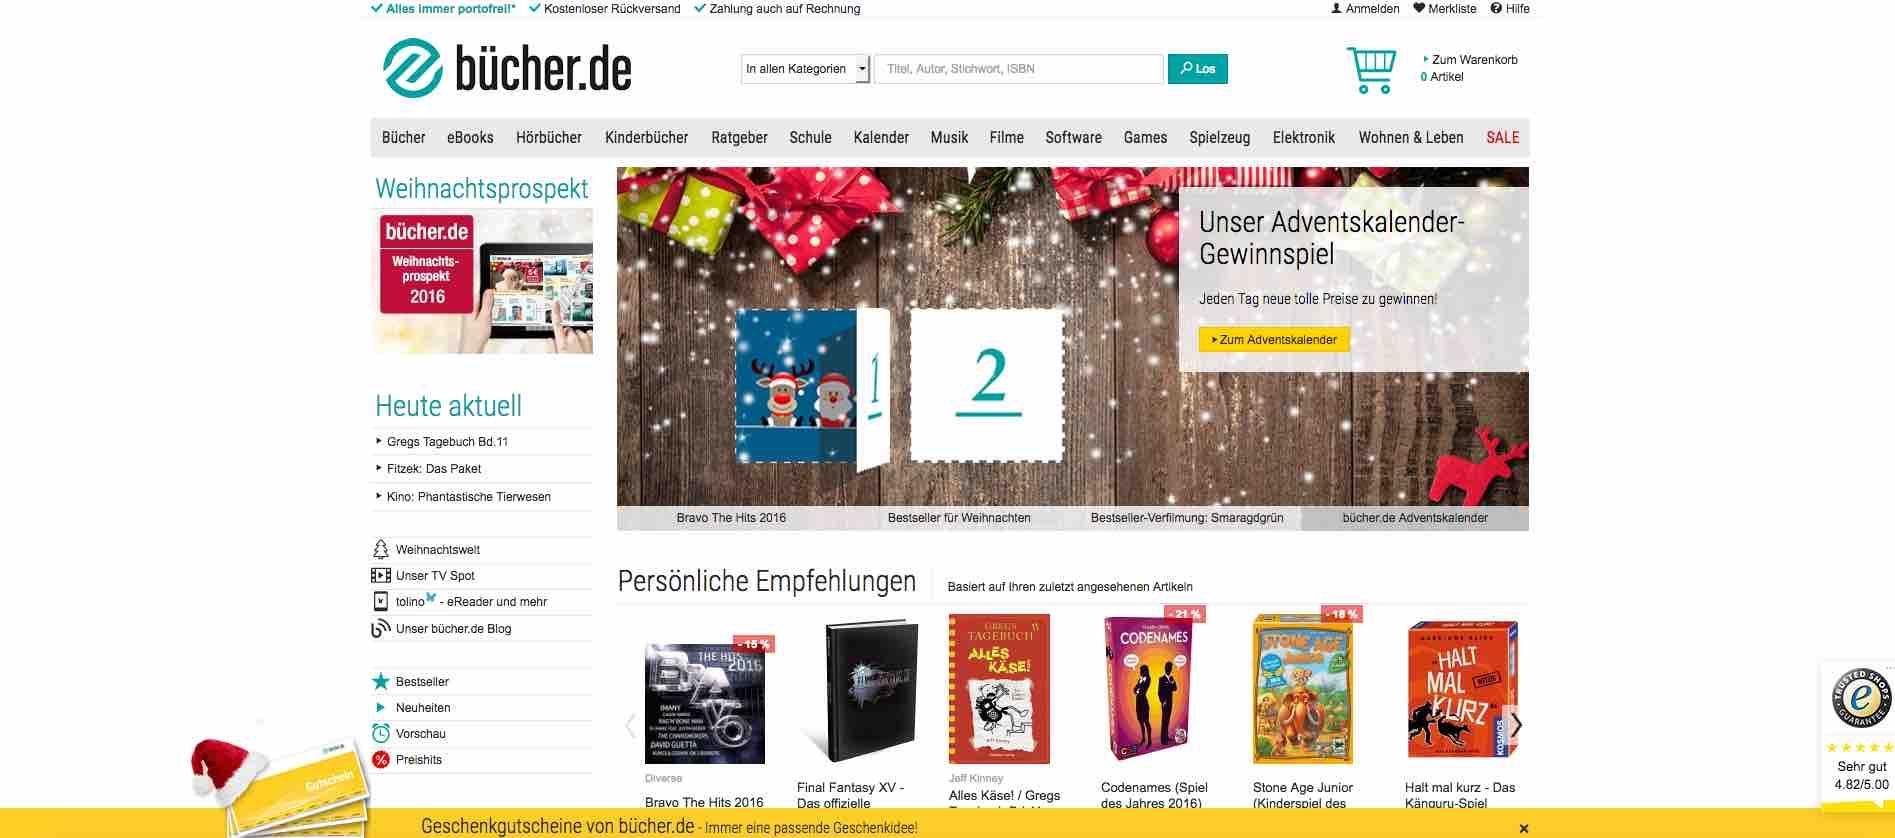 bücher.de Online Adventskalender Gewinnspiel 2016